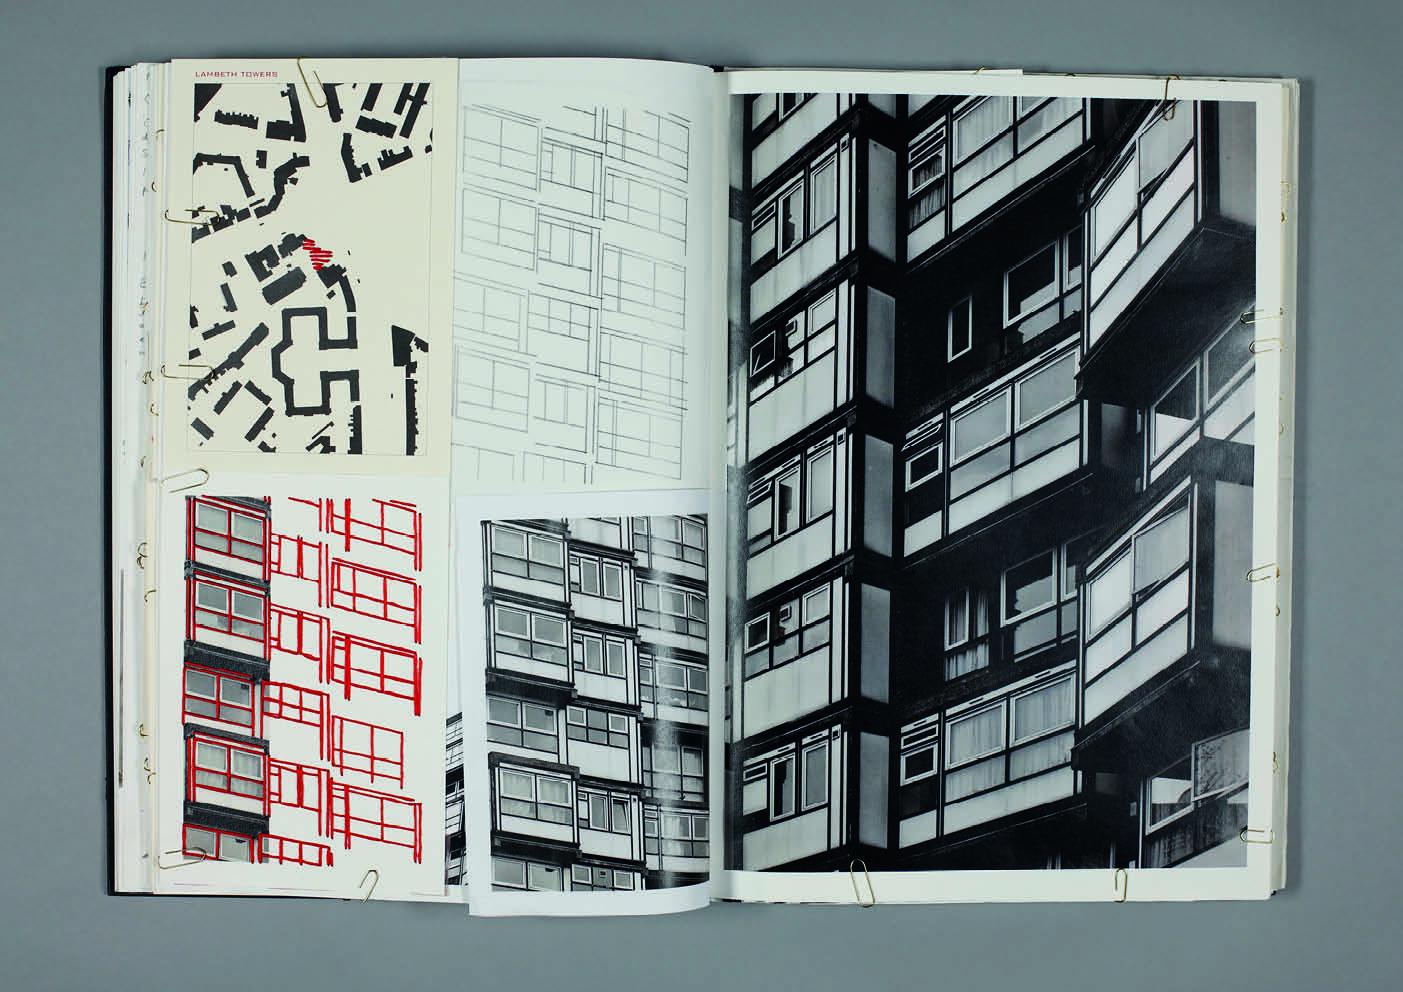 Design by Mils Brutalist Embroidery Sketchbook Page